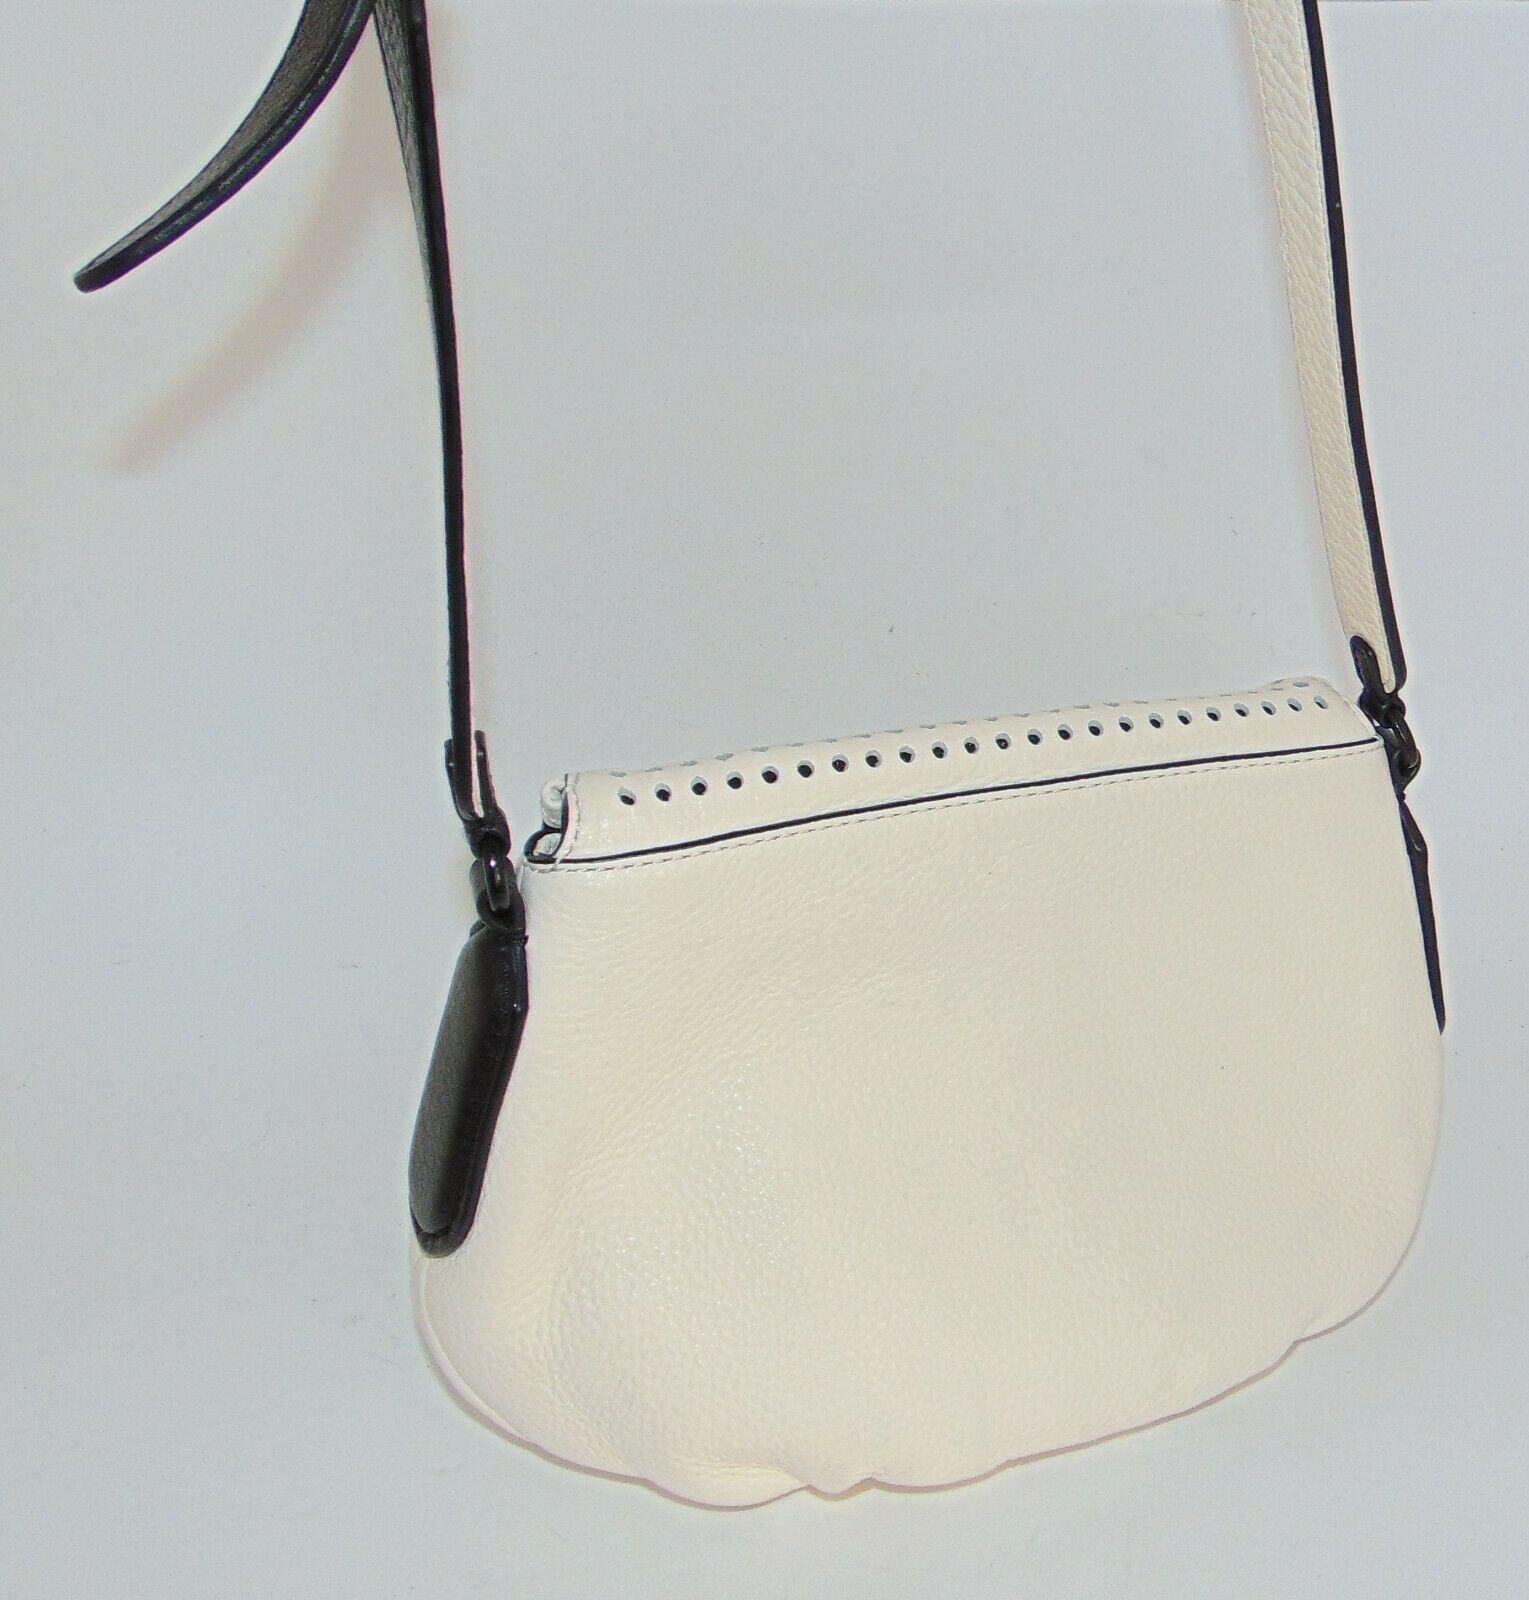 Marc by MARC JACOBS New Q Perforated Mini Natasha Bag  Black/Milk image 3